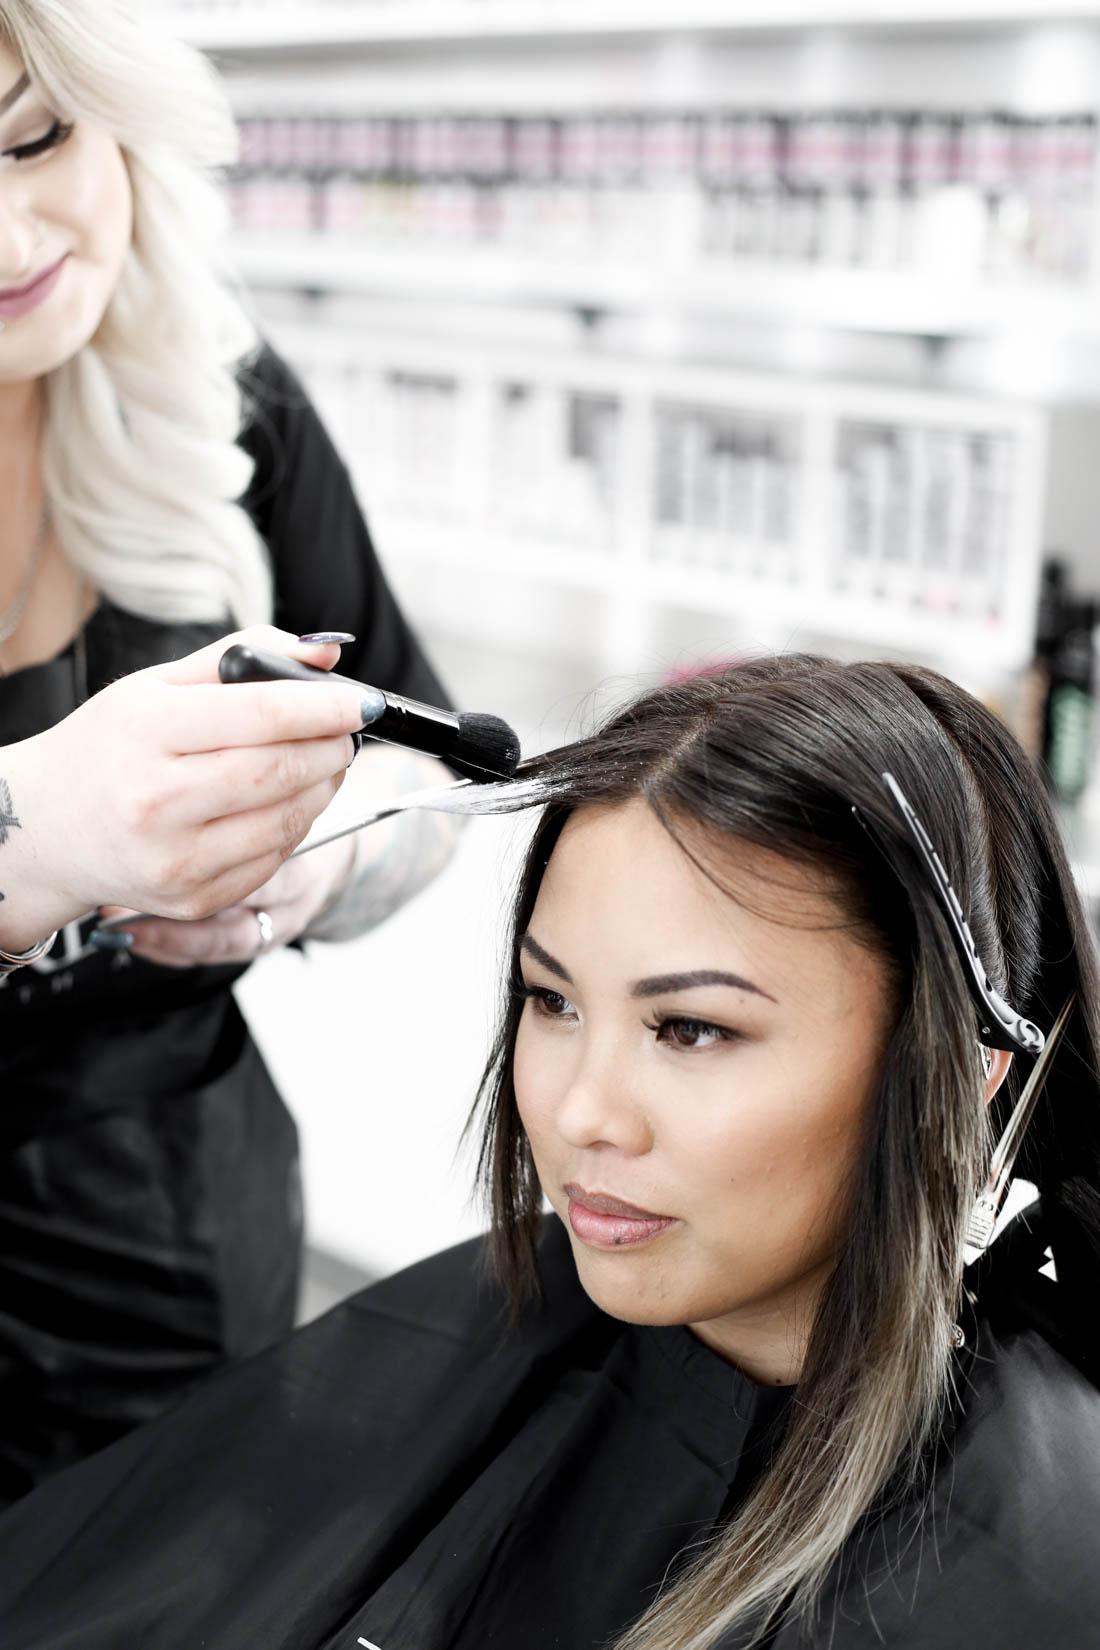 Ulta Beauty The Salon Almaden Ranch San Jose Balayage | The Beauty Vanity